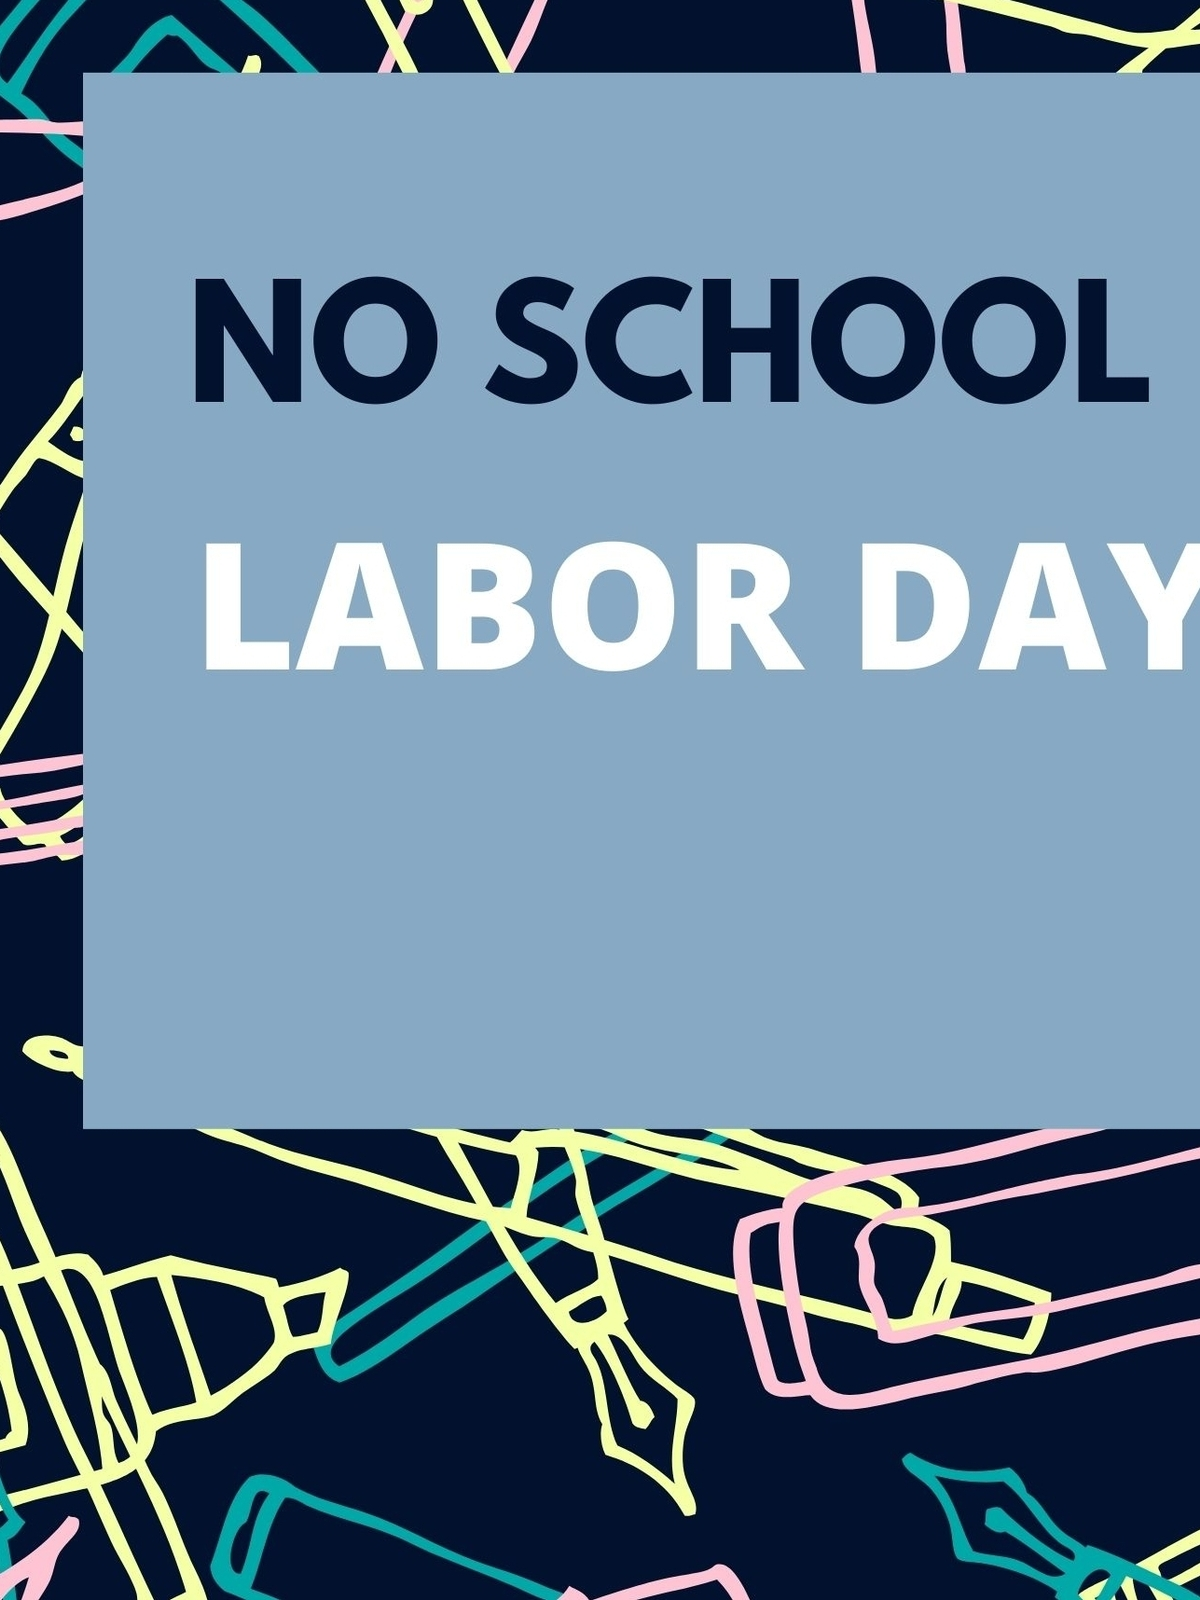 Labor Day-No School